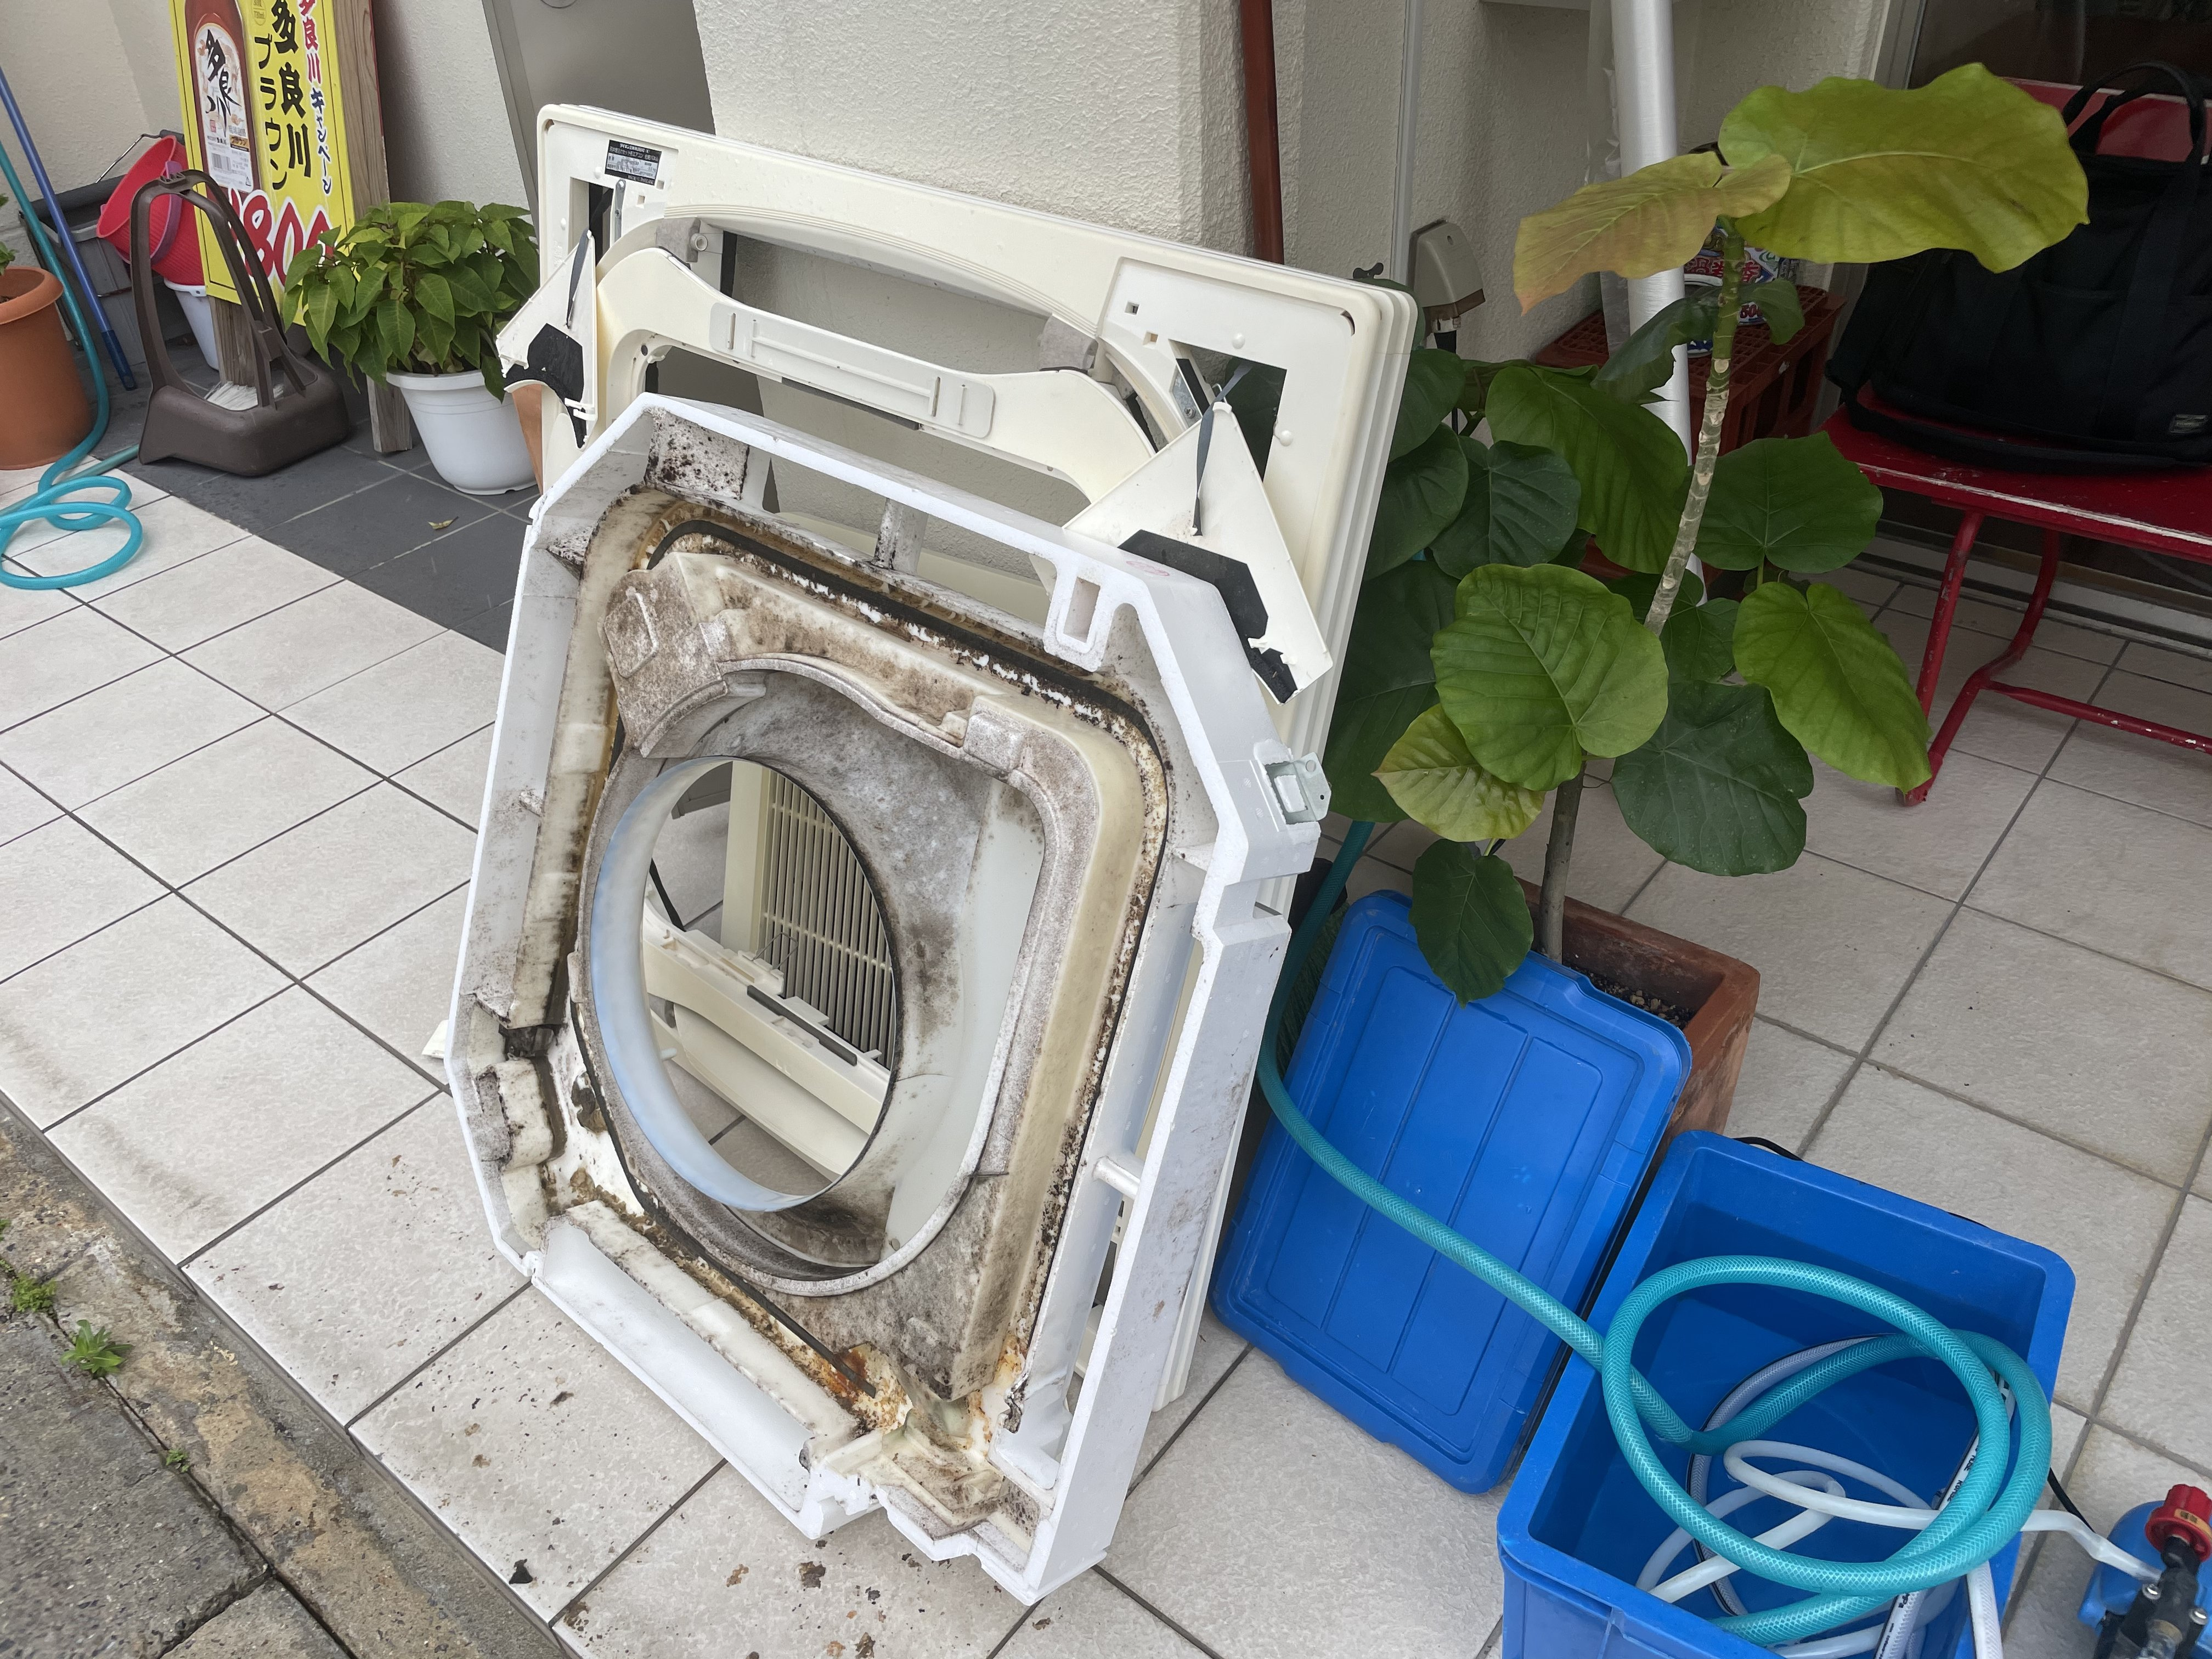 YAMASHITA様専用エアコンクリーニング分解洗浄 他のイメージその4